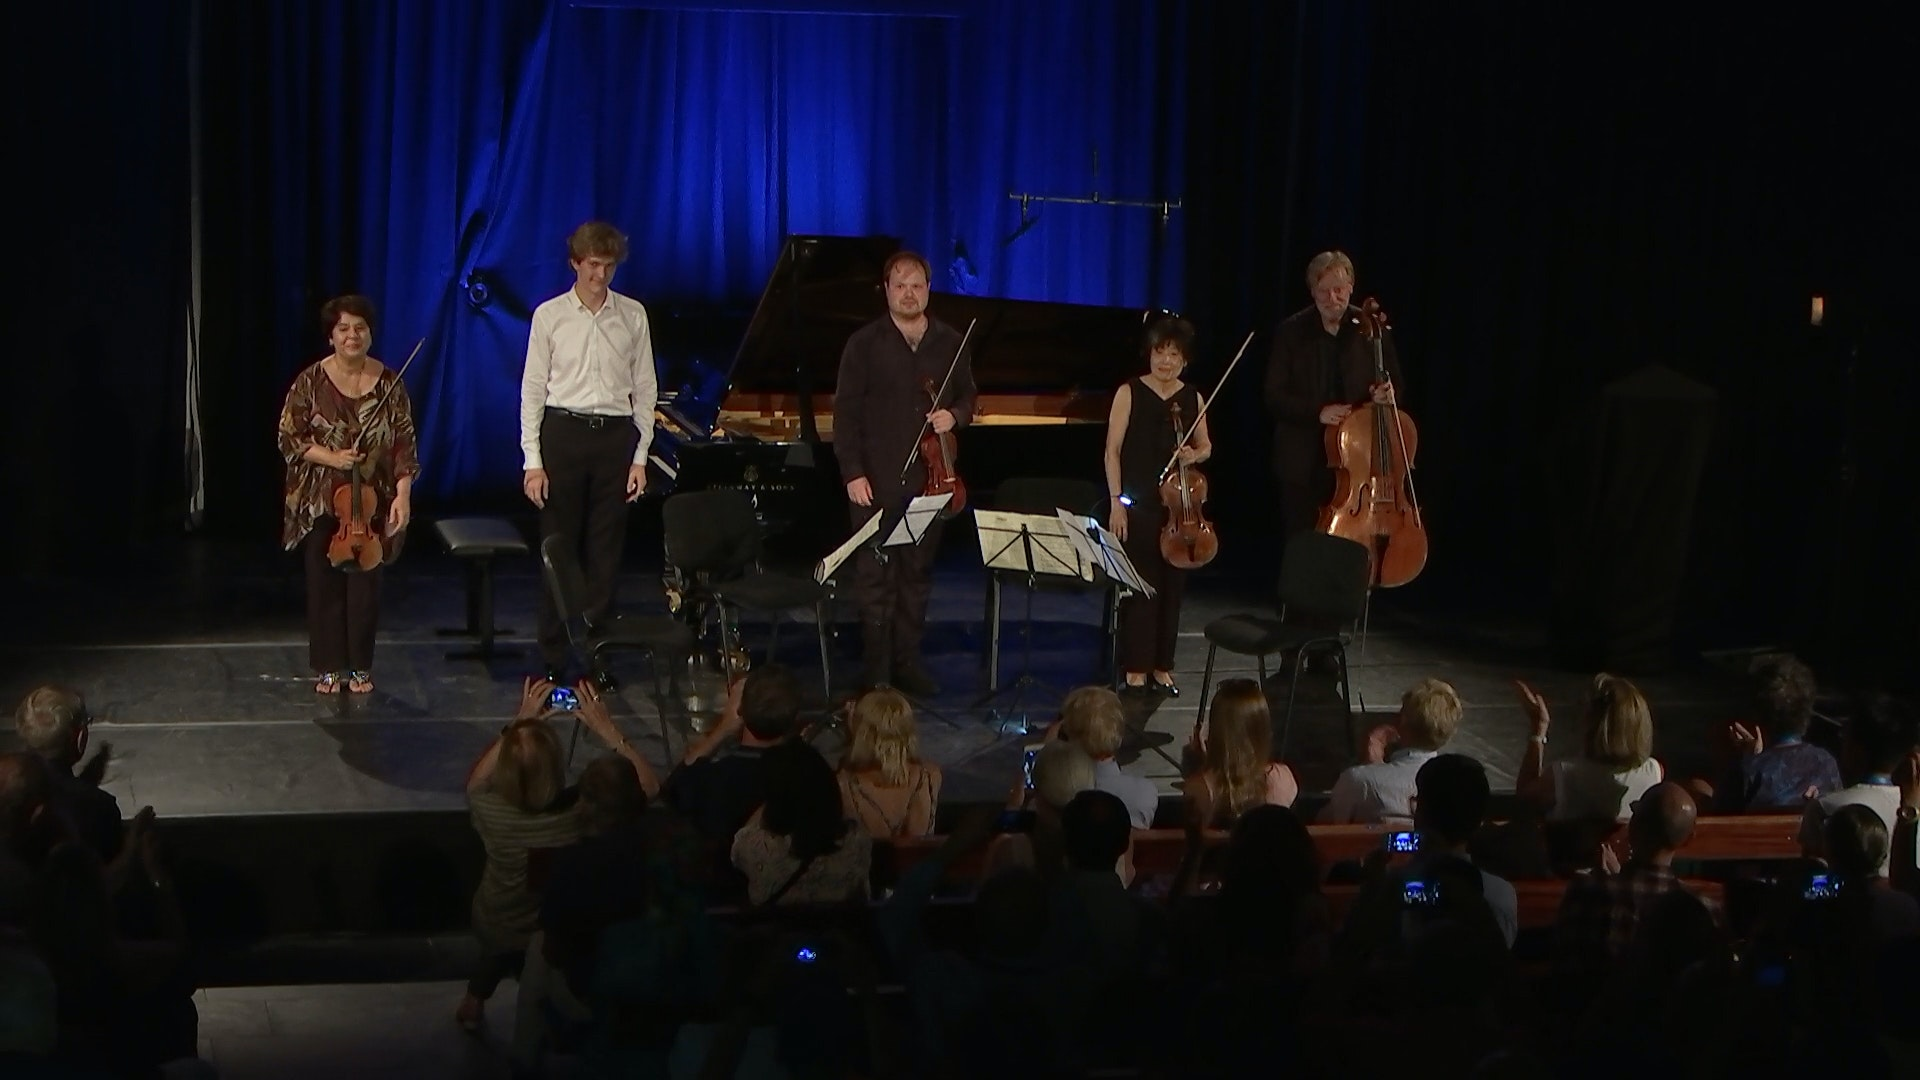 The Michelangelo String Quartet and Jan Lisiecki play Schubert, Bartók, and Schumann